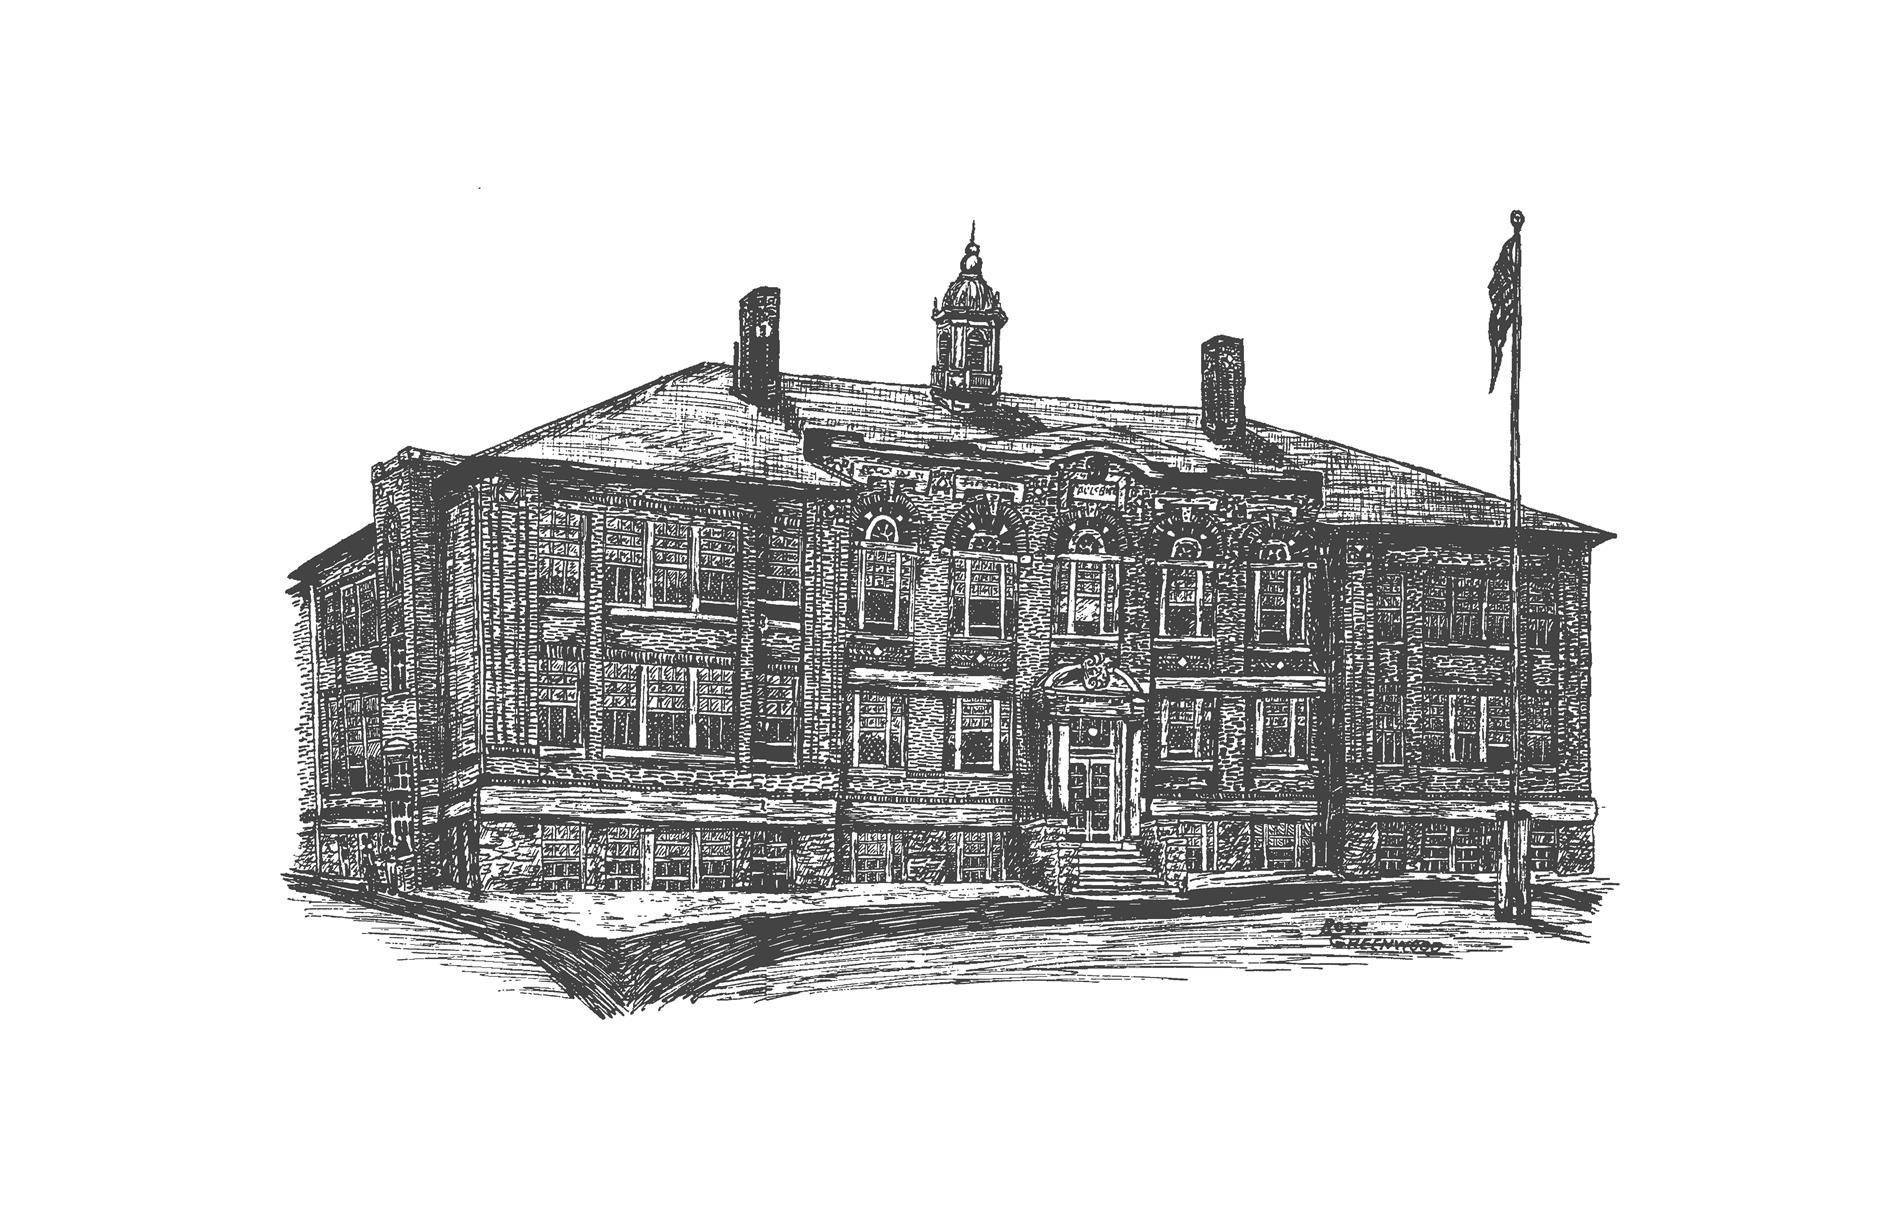 Sketch of High School